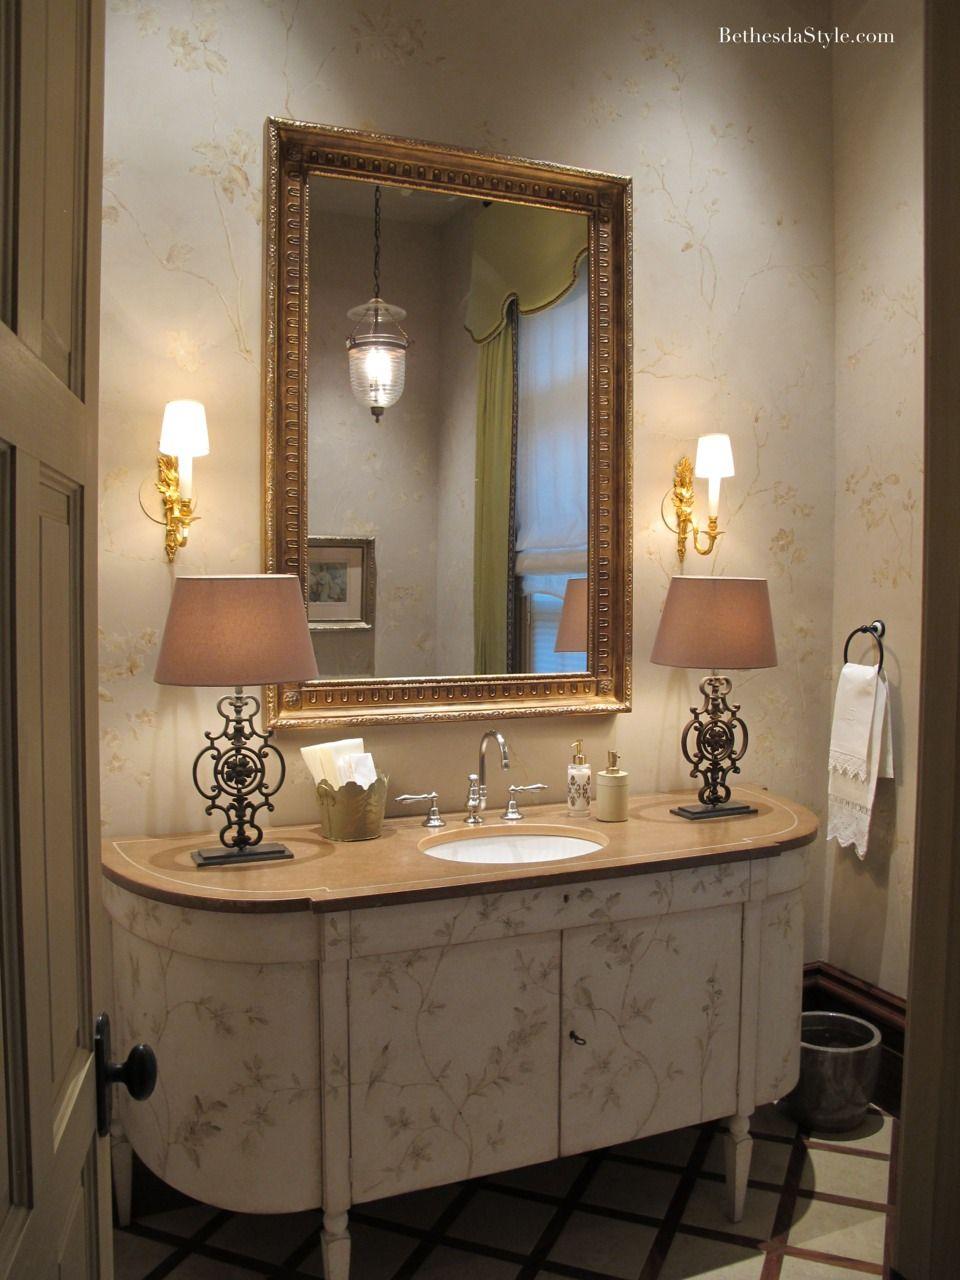 Bethesdastyle Powder Room Interior Designer Barry Dixon With Images Powder Room Decor Ladies Bathroom Powder Room